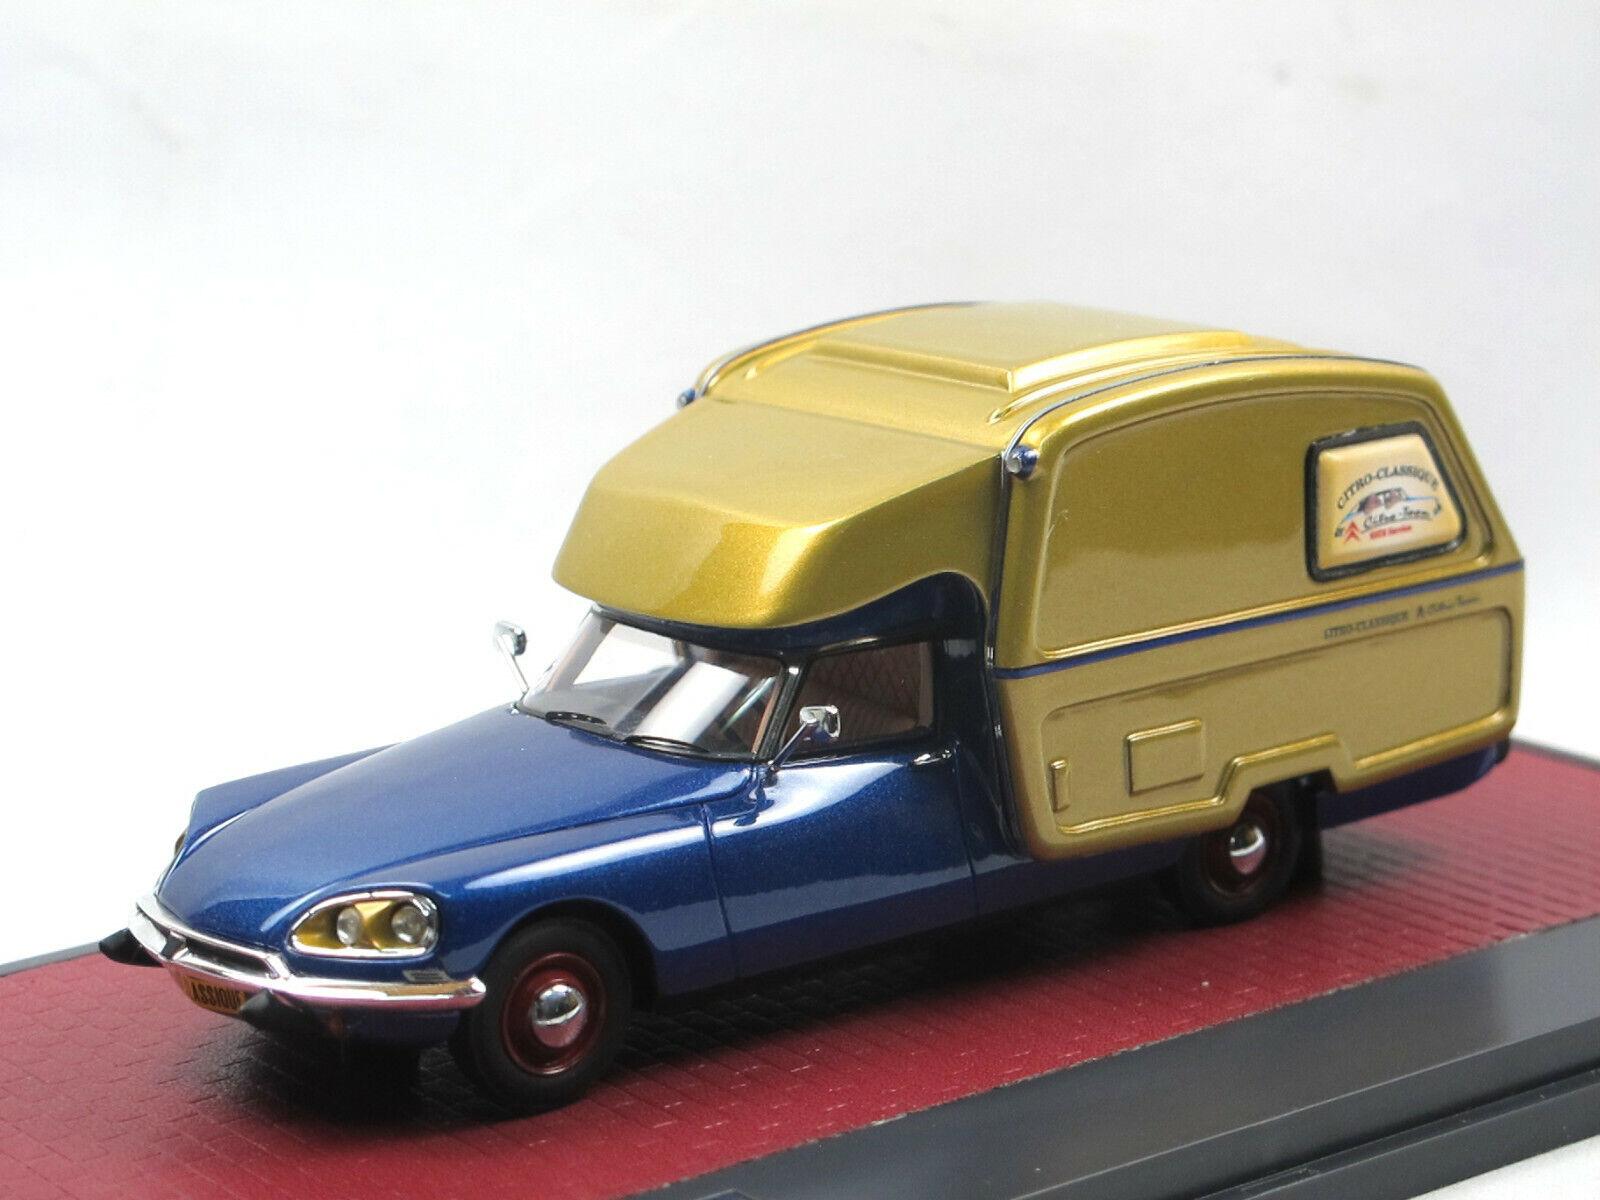 precio razonable Matrix scale models models models 1973 citroen ID DS Camper azul oro 1 43 Limited Edition  despacho de tienda